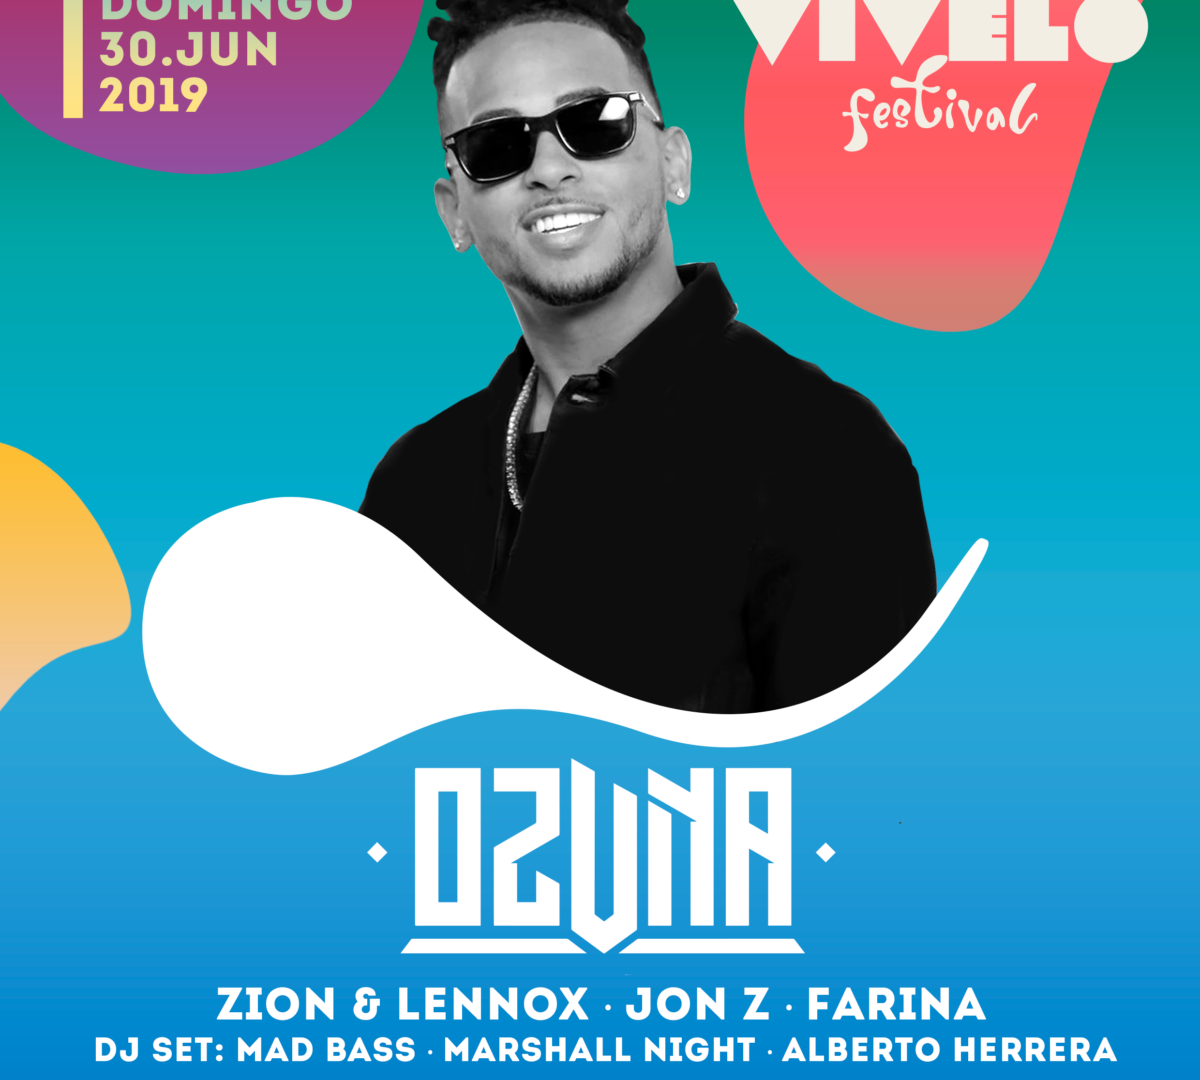 Ozuna en Barcelona - Vivelo Festival